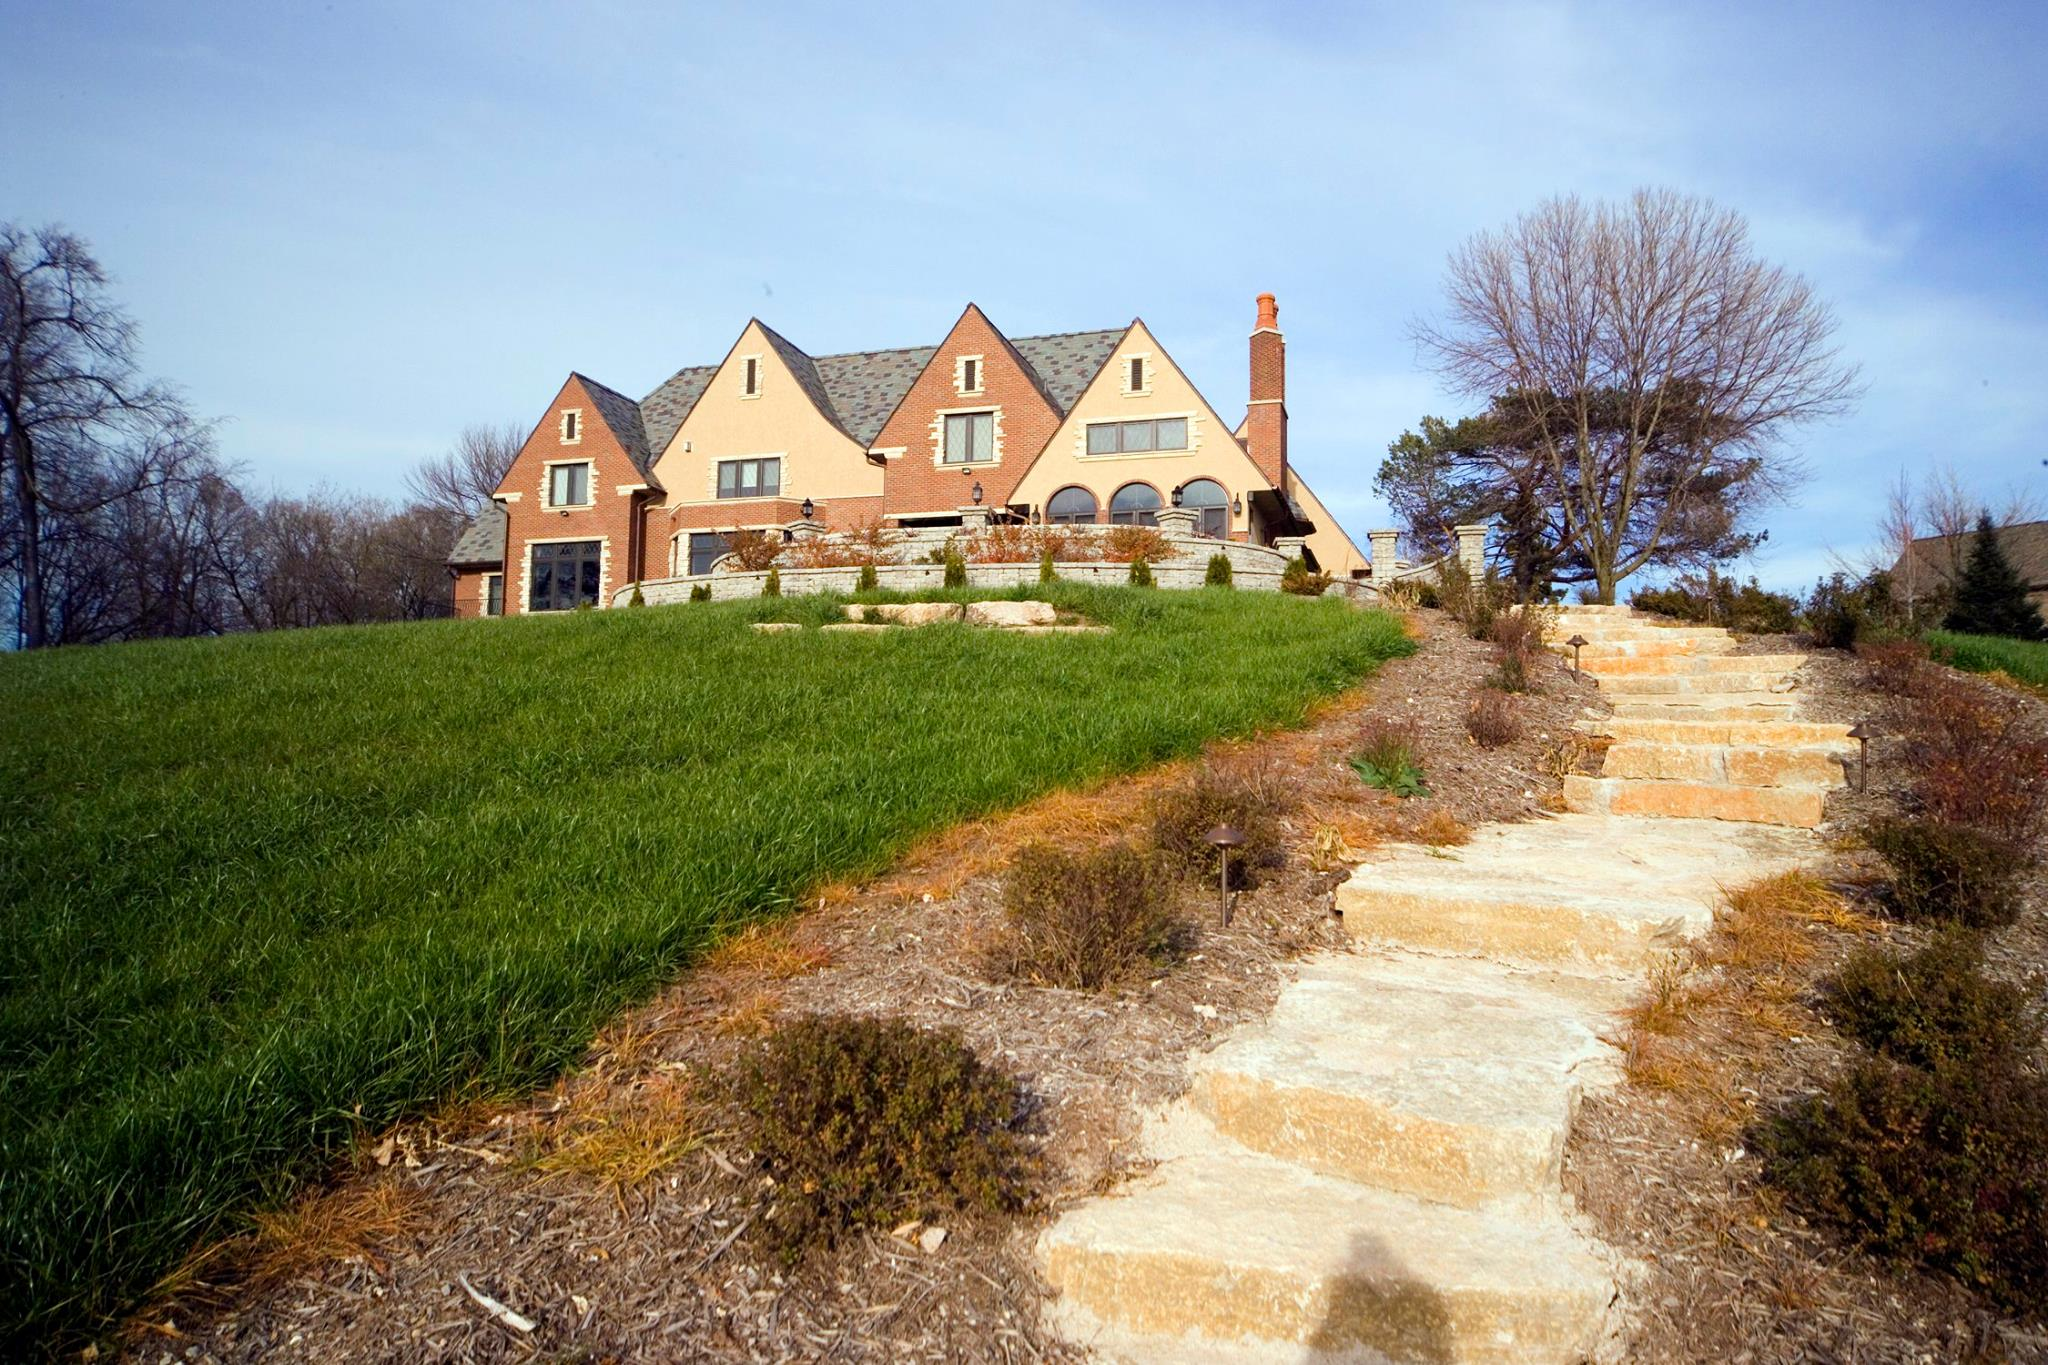 Vosters Landscaping | Landscape design | Maintenance | Shrubs | Plants | Trees | Paver Stairs